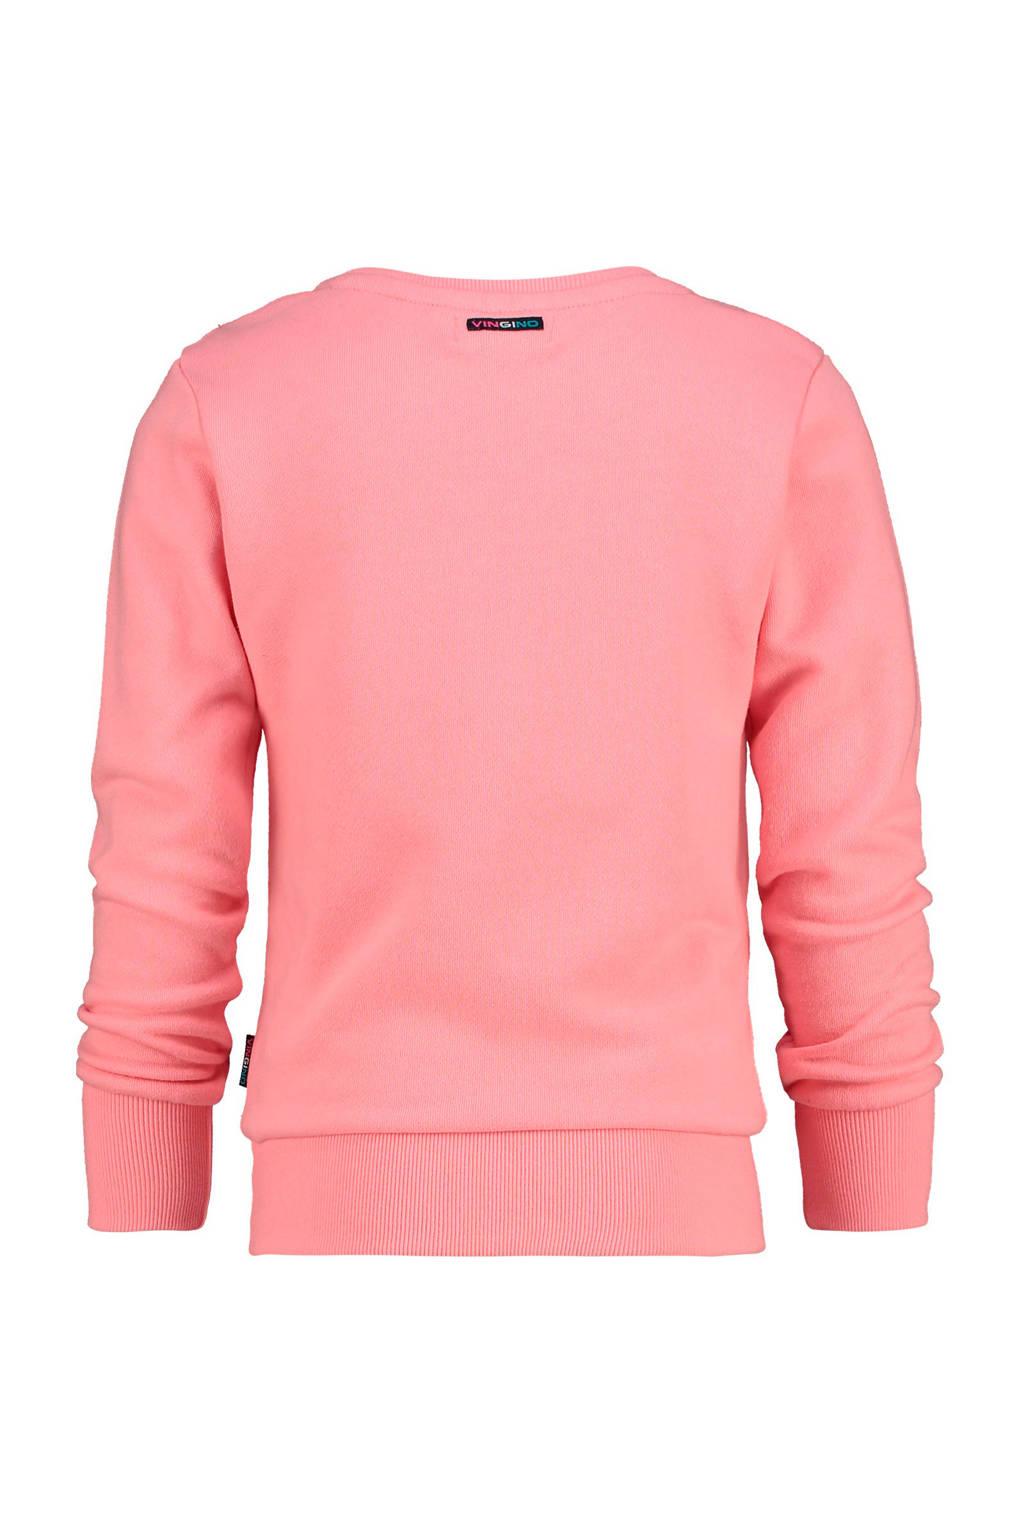 Vingino sweater Newis met printopdruk en pailletten roze, Roze